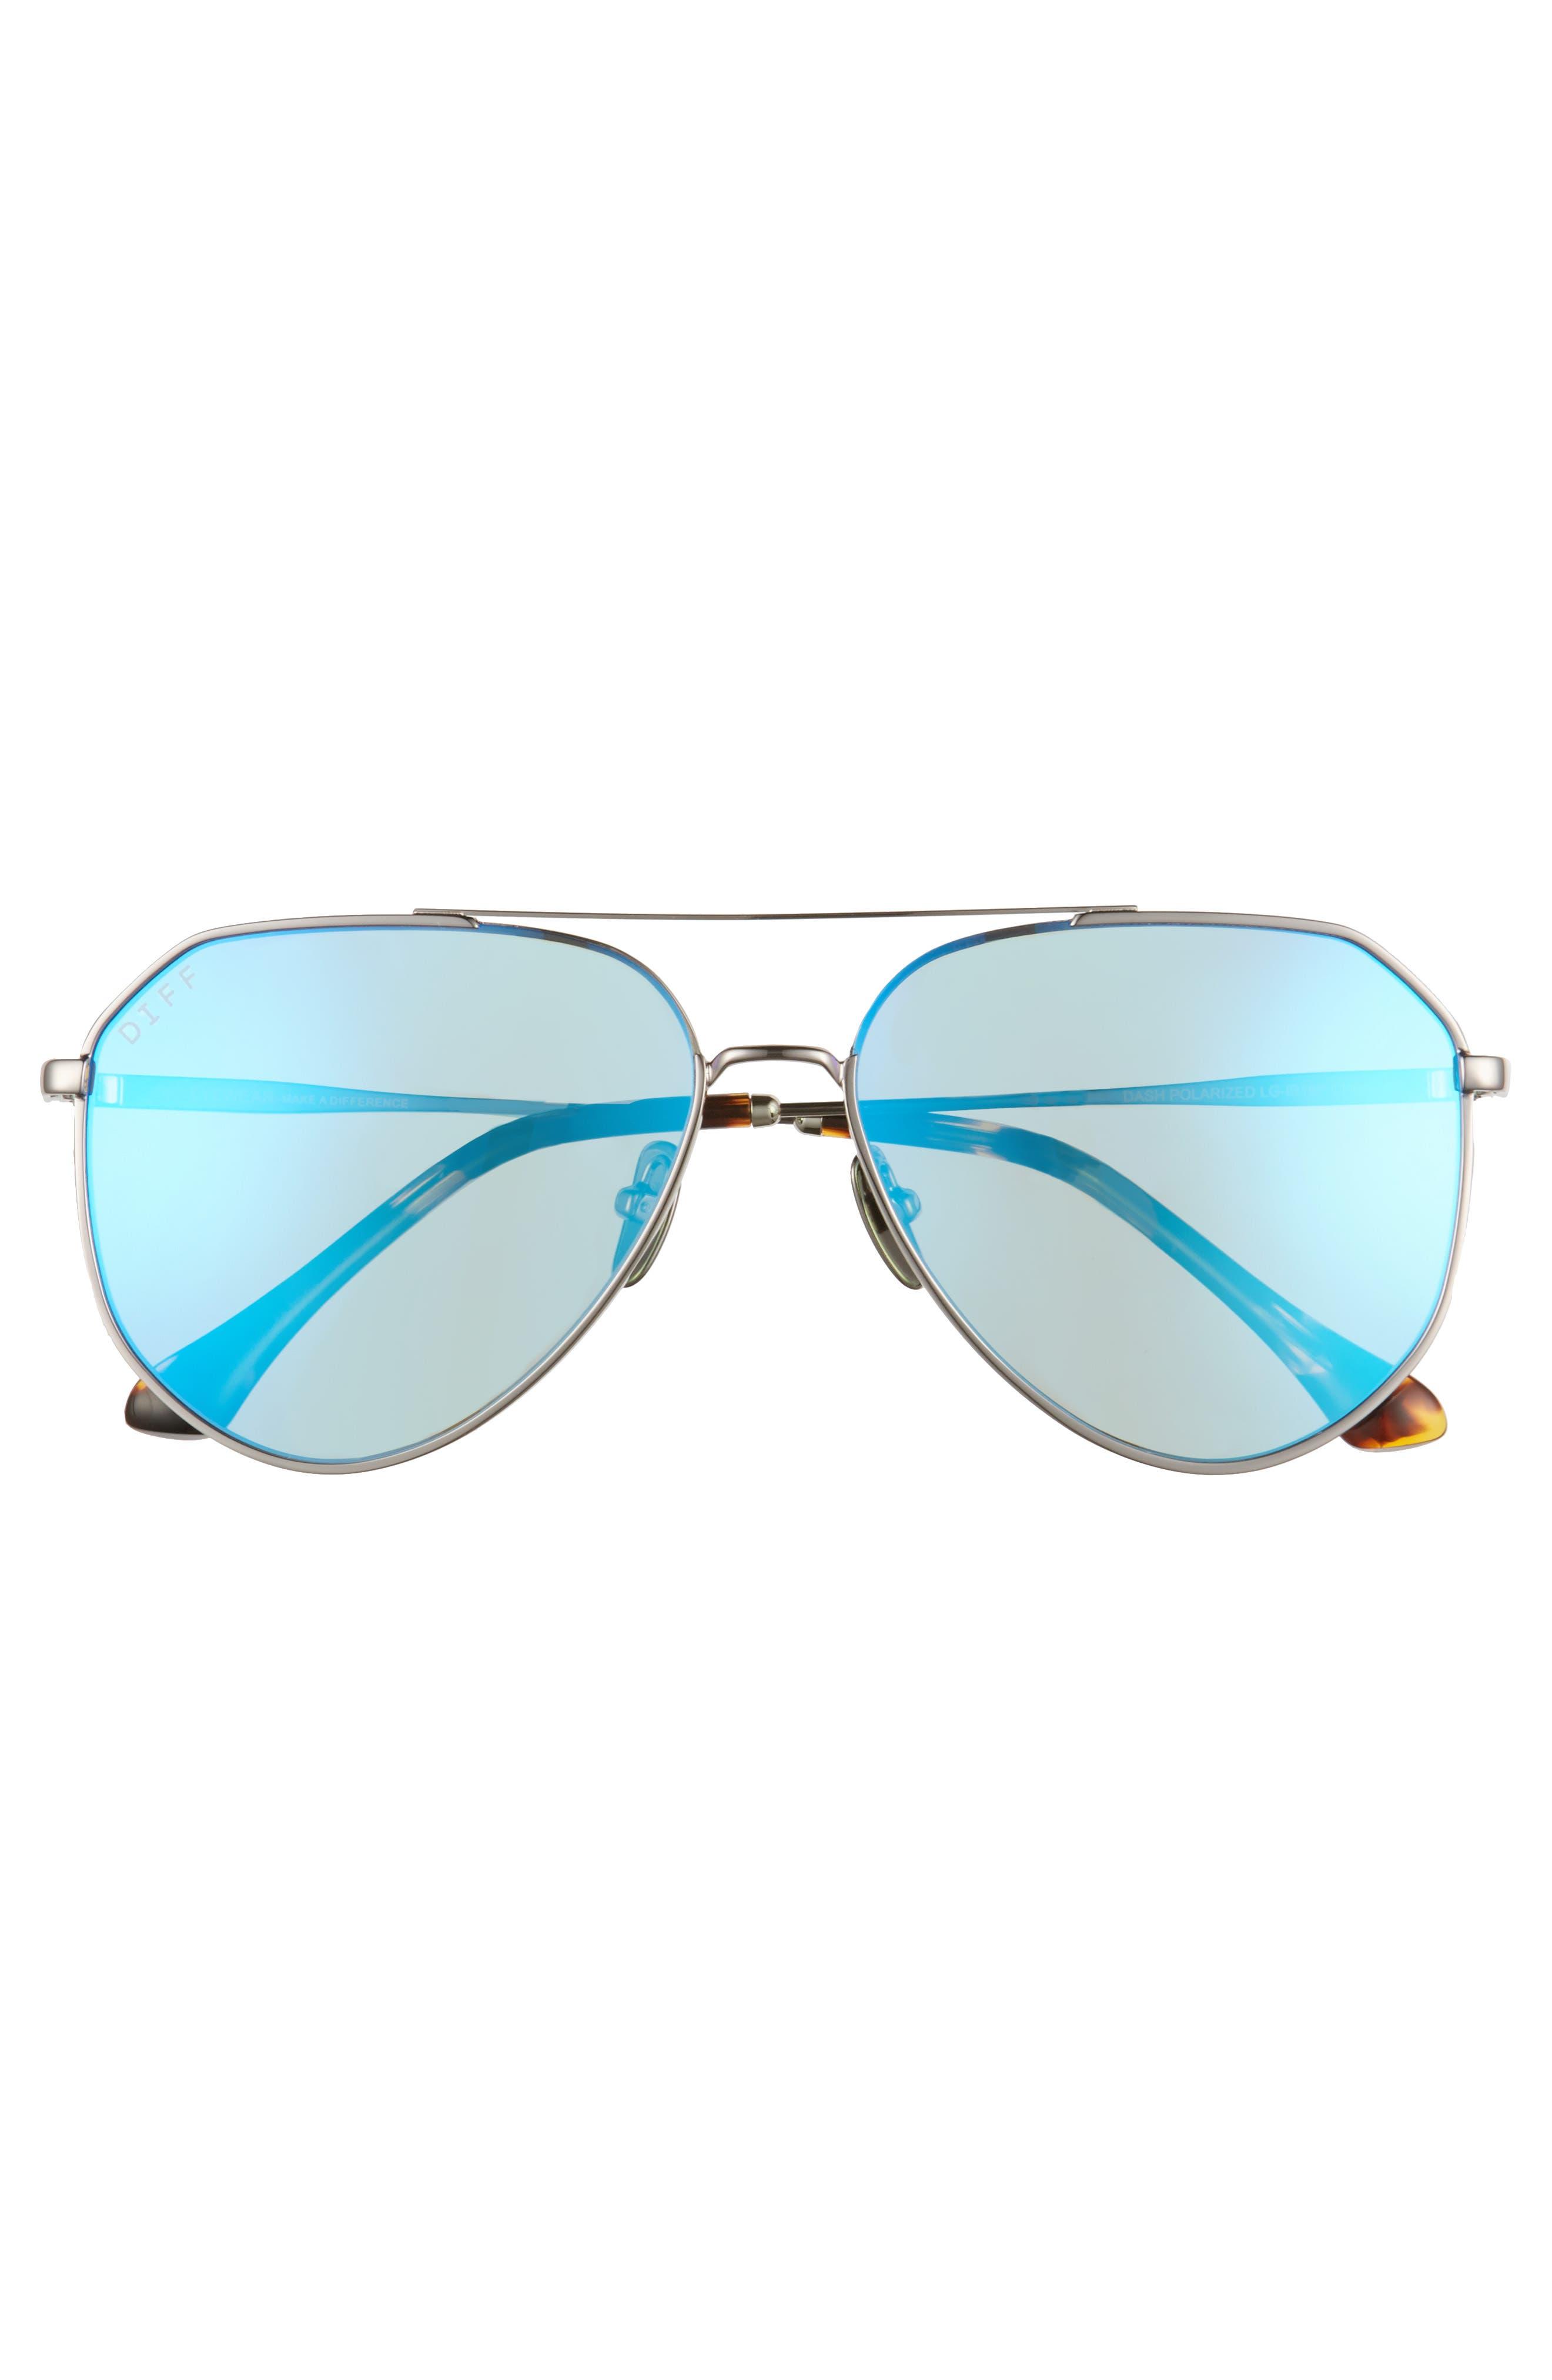 Dash 61mm Polarized Aviator Sunglasses,                             Alternate thumbnail 3, color,                             GUNMETAL/ ICE BLUE